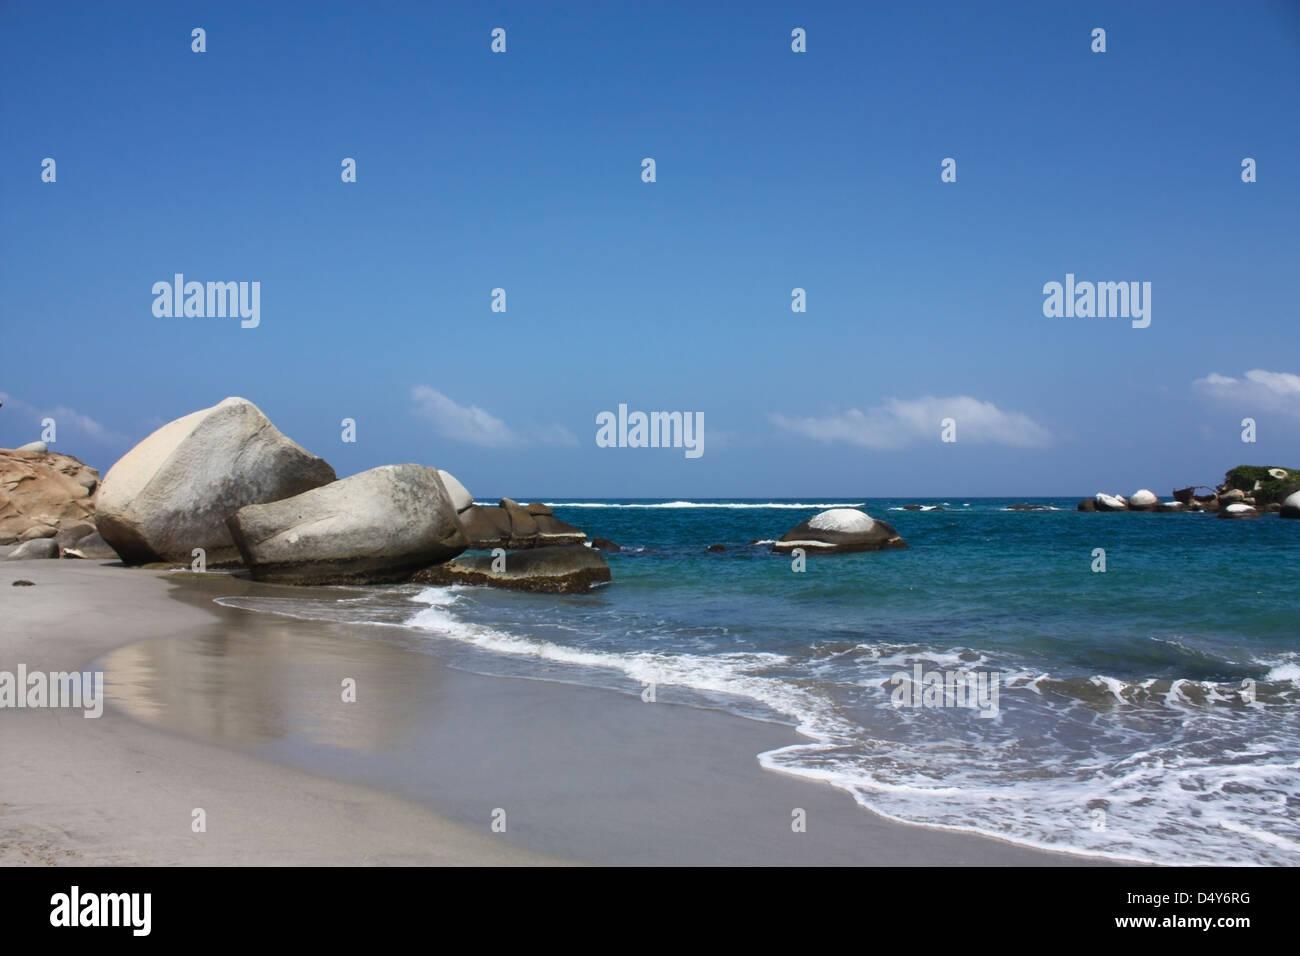 Strand im Tayrona National Park, karibische Region in Kolumbien. Stockfoto